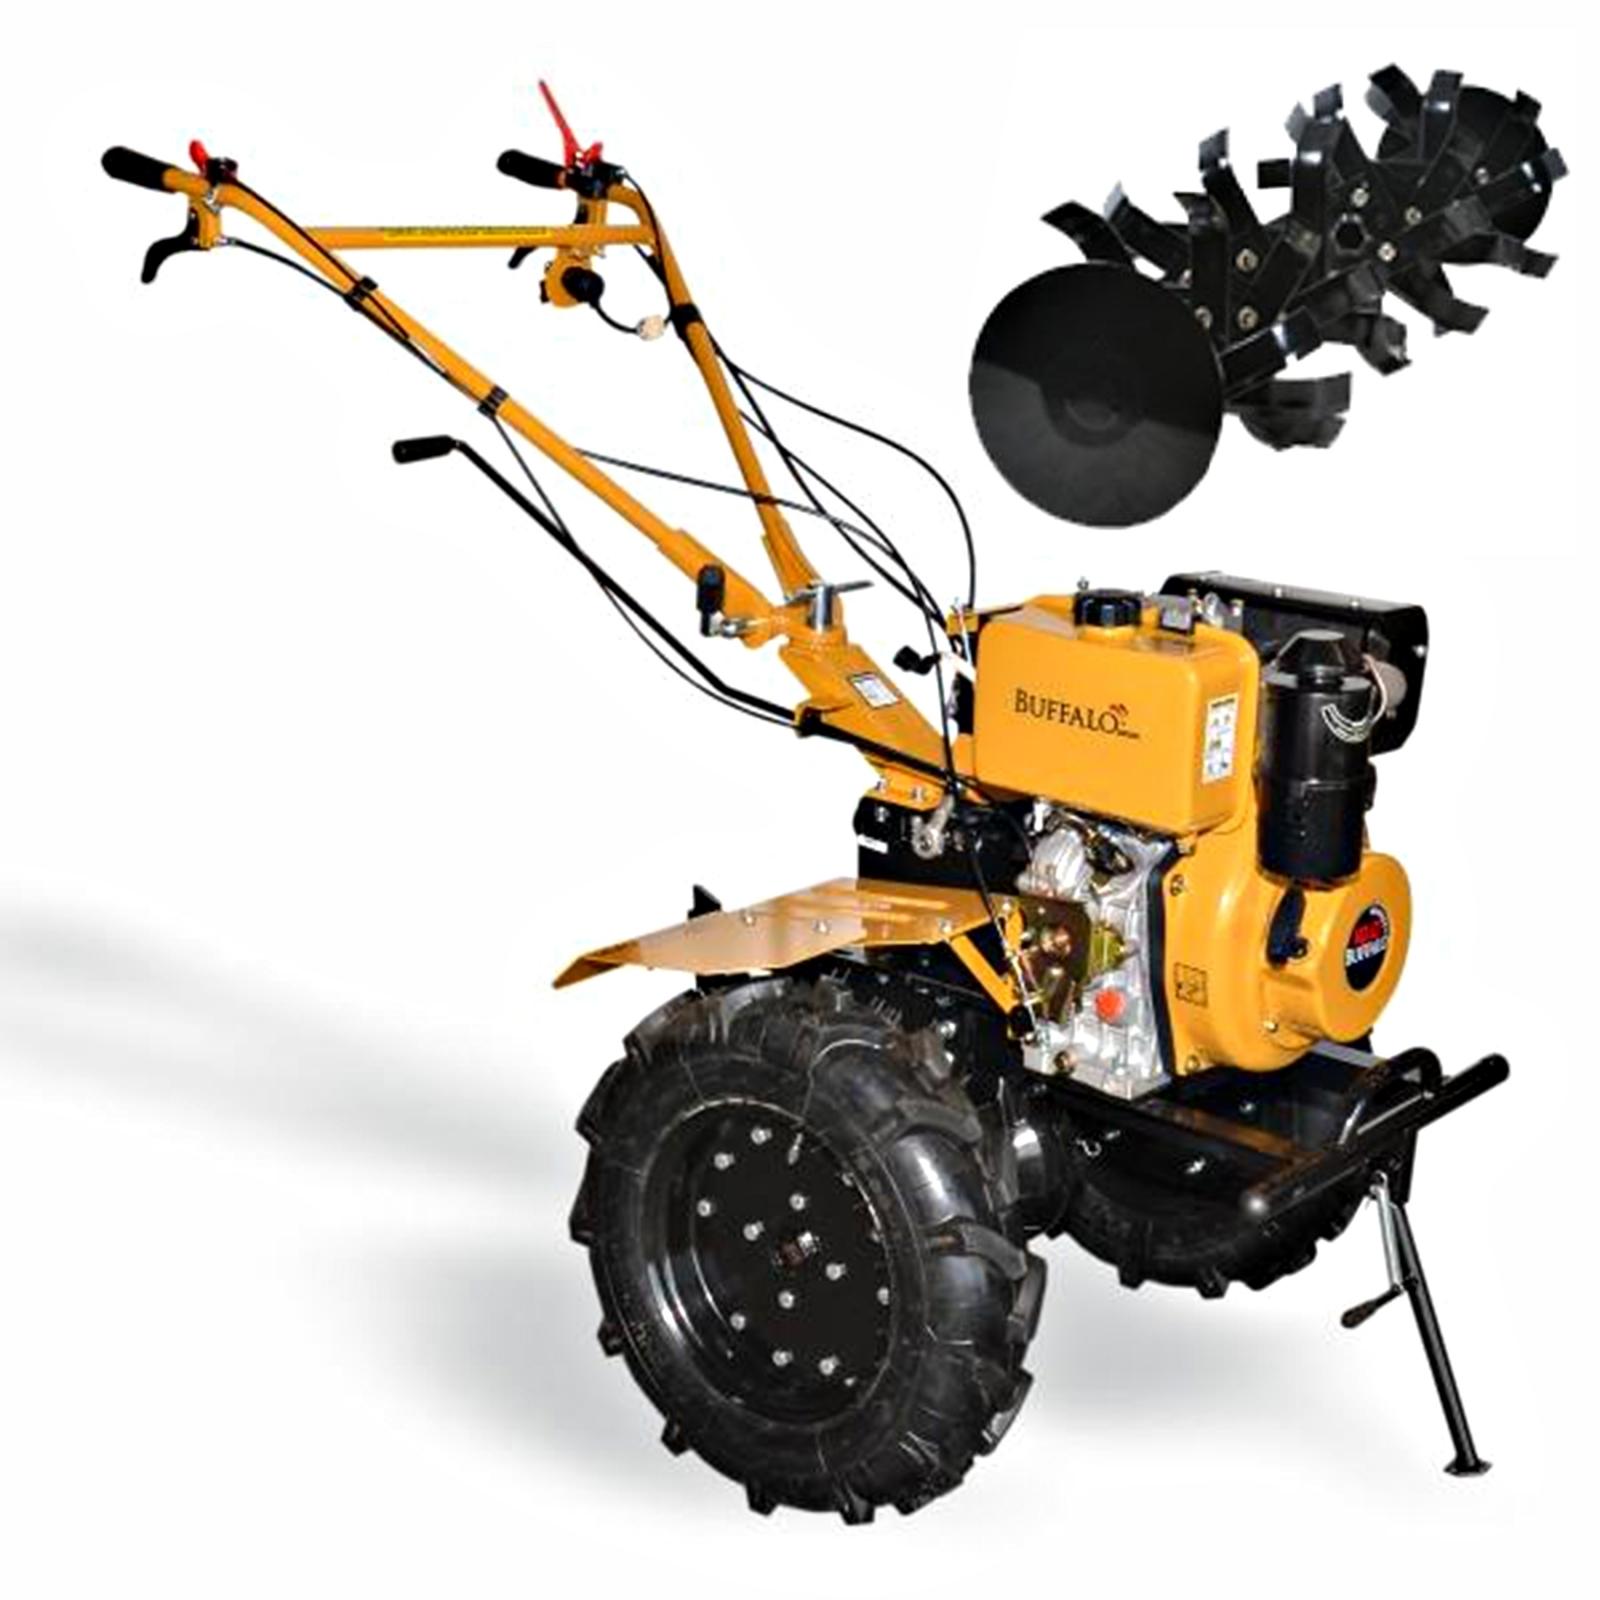 Motocultivador A Diesel Com Enxada Rotativa Buffalo Bfde 1120 Plus Mc7 - Ferramentas MEP